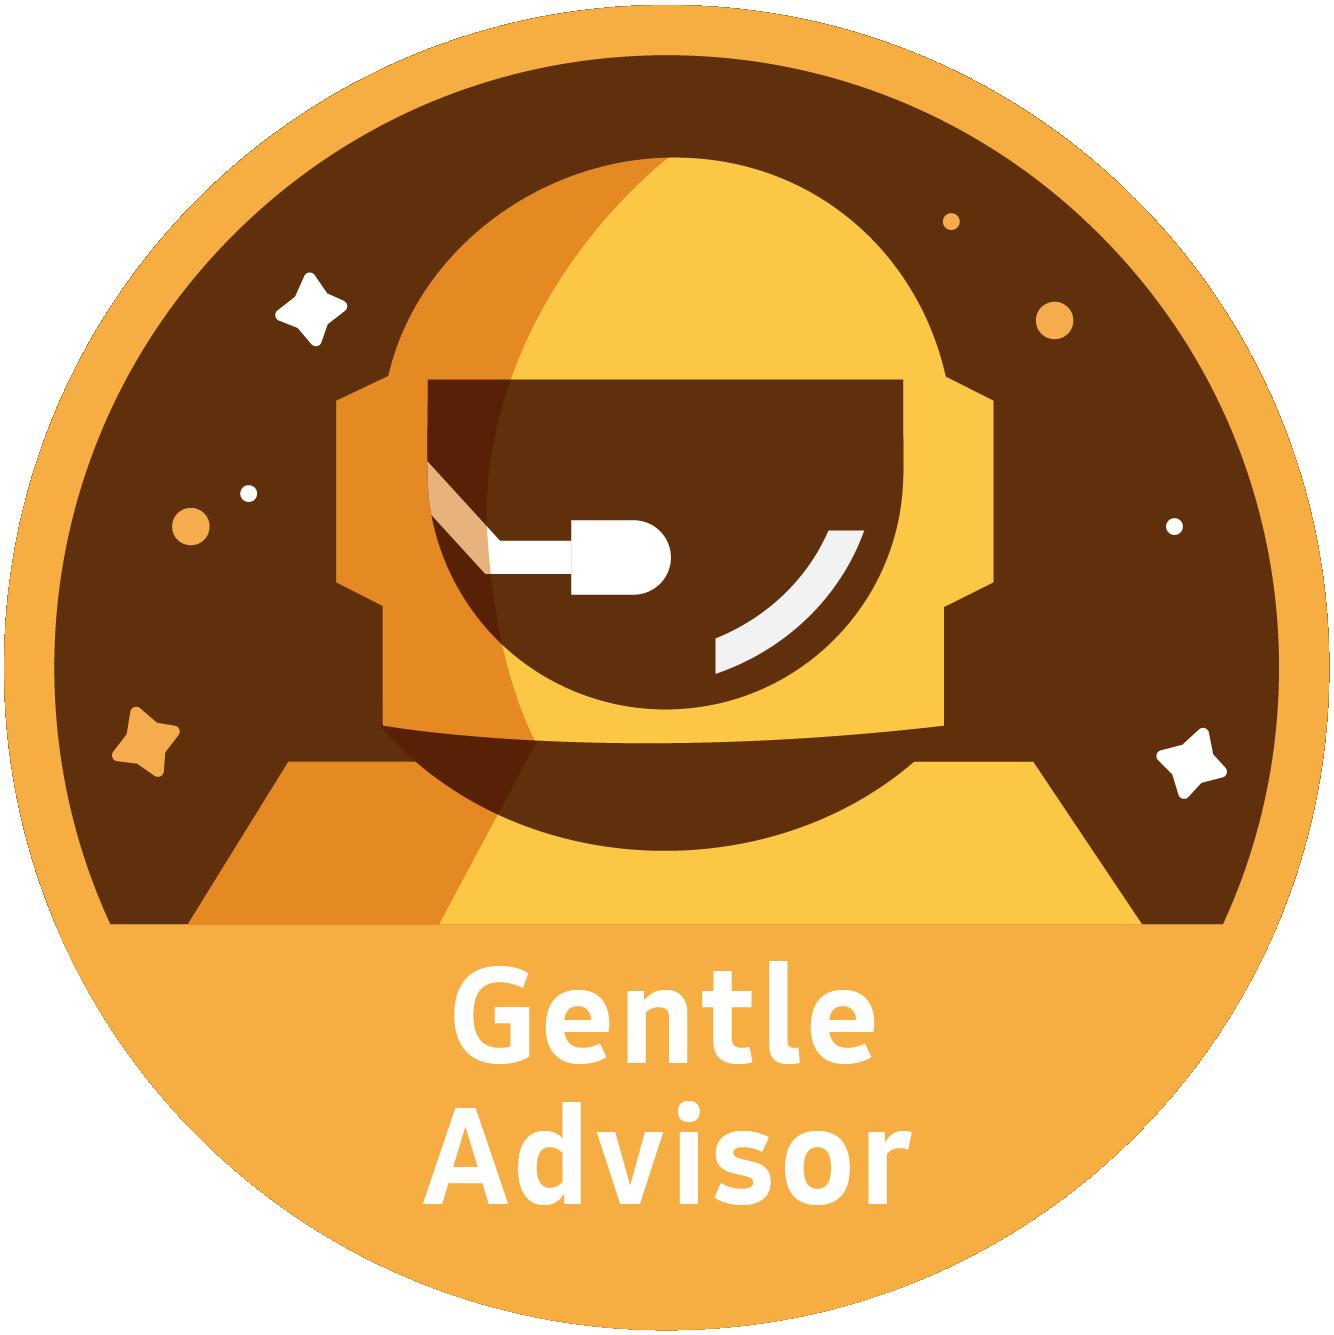 Gentle Advisor